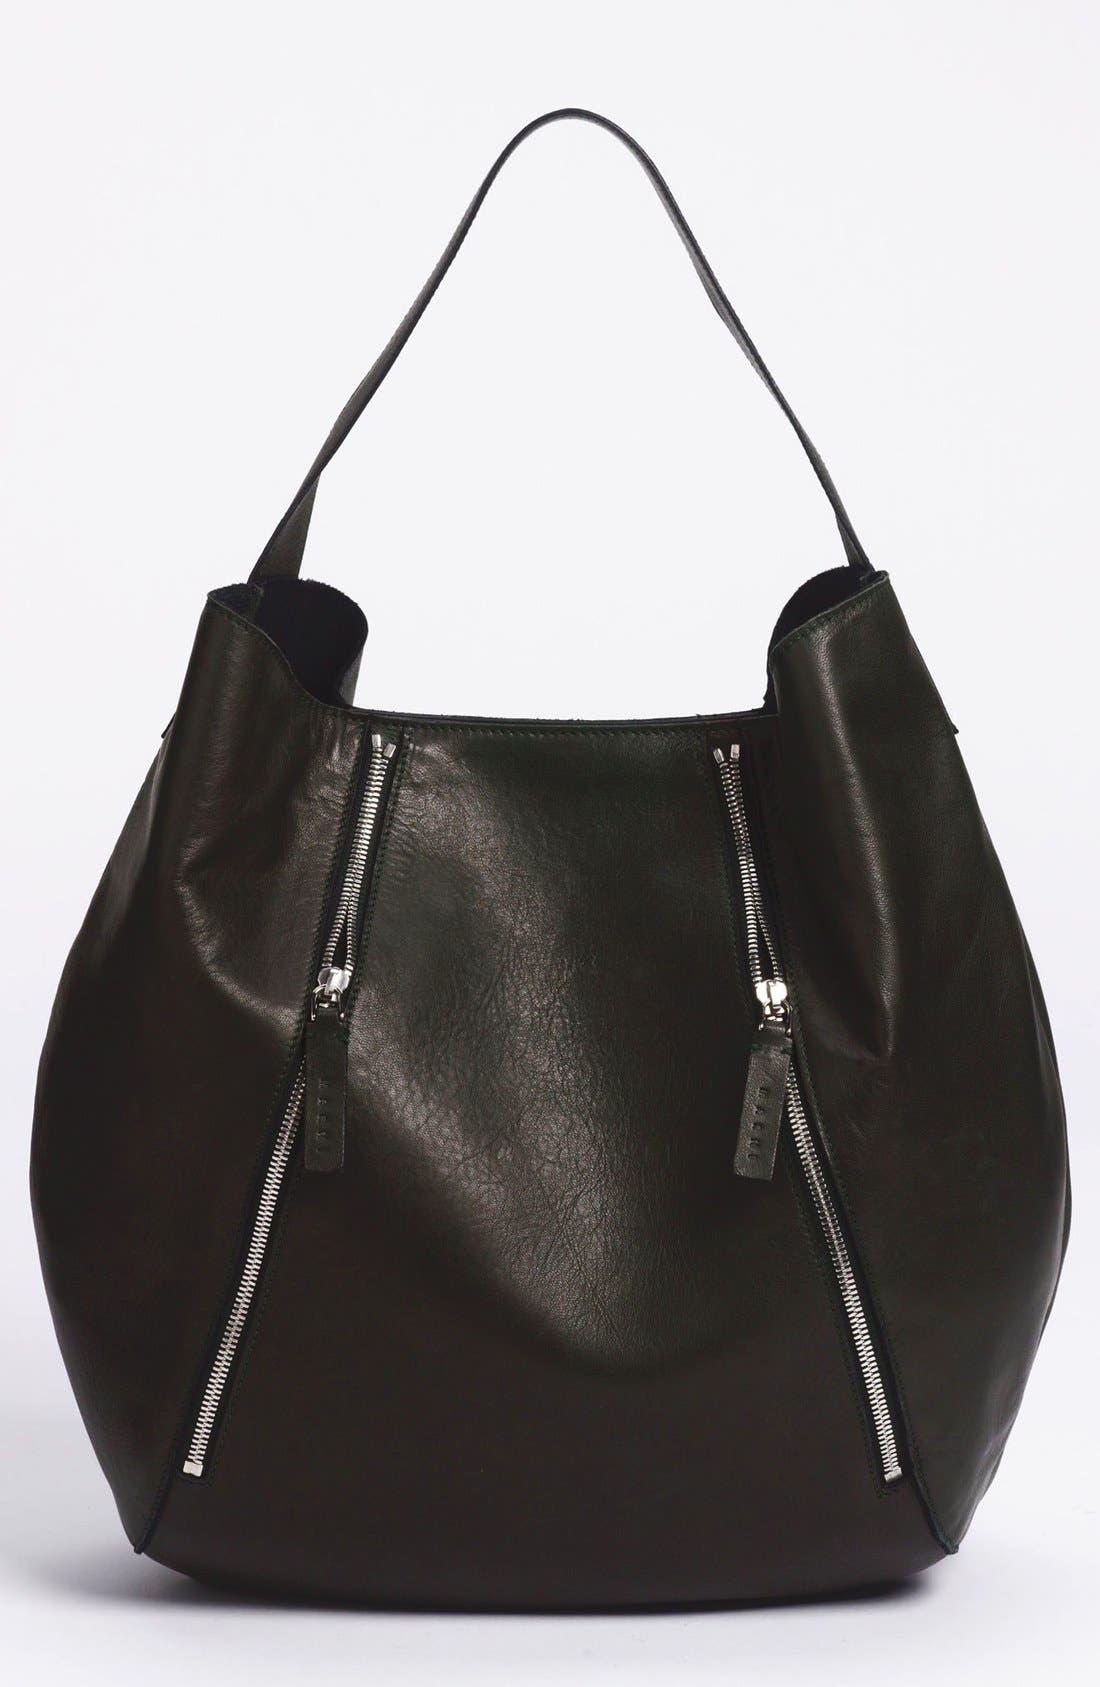 Alternate Image 1 Selected - Marni Leather Hobo